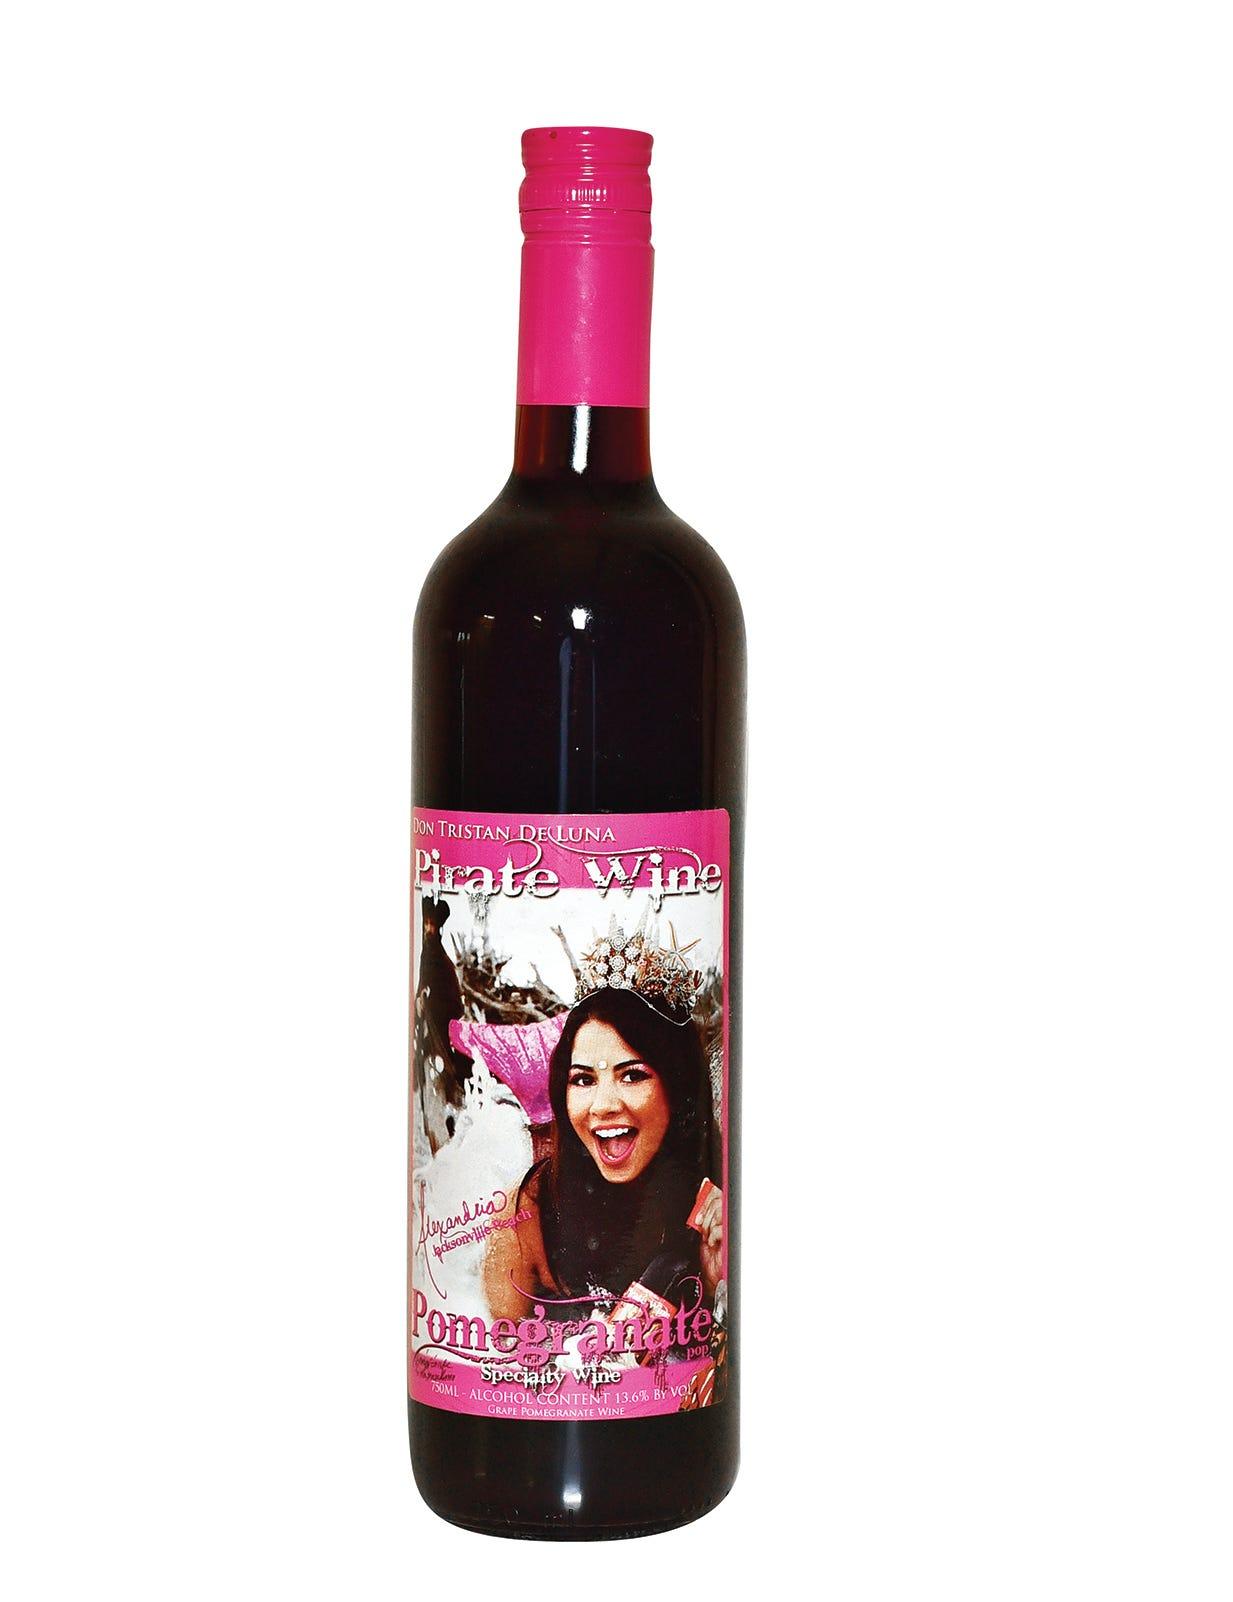 Deluna Winery Pomegranate Wine